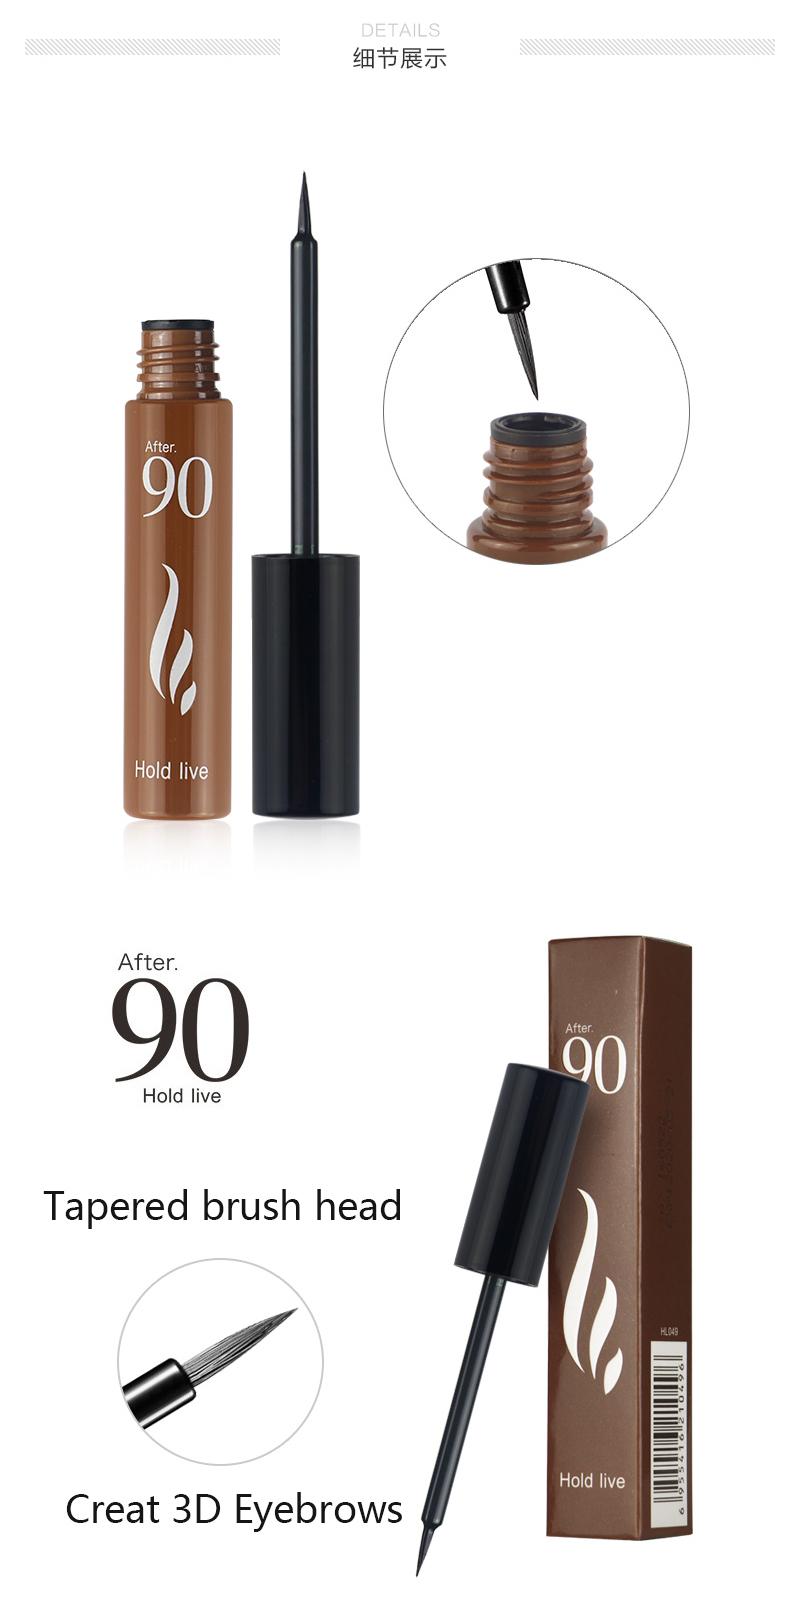 Hold Live Eyebrow Tint Peel Off Eyebrow Enhancer Tattoo Gel 3 Color Dye Cream Waterproof 72H Long Lasting Natural Eyebrow Makeup 8